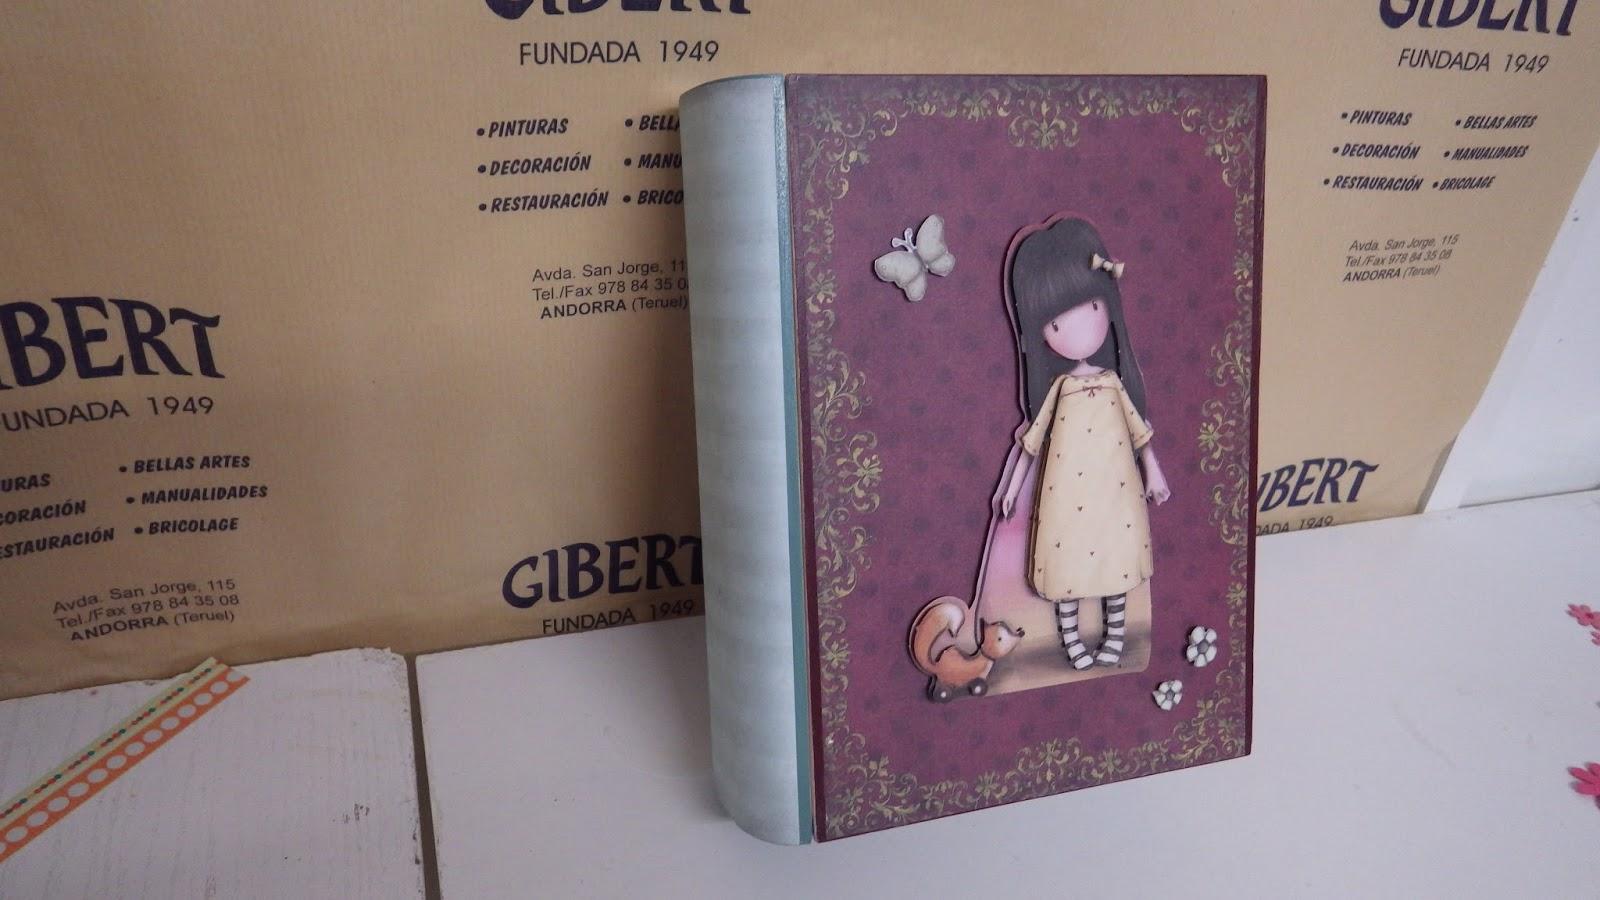 Manualidades gibert cajas de madera varias - Manualidades cajas madera ...